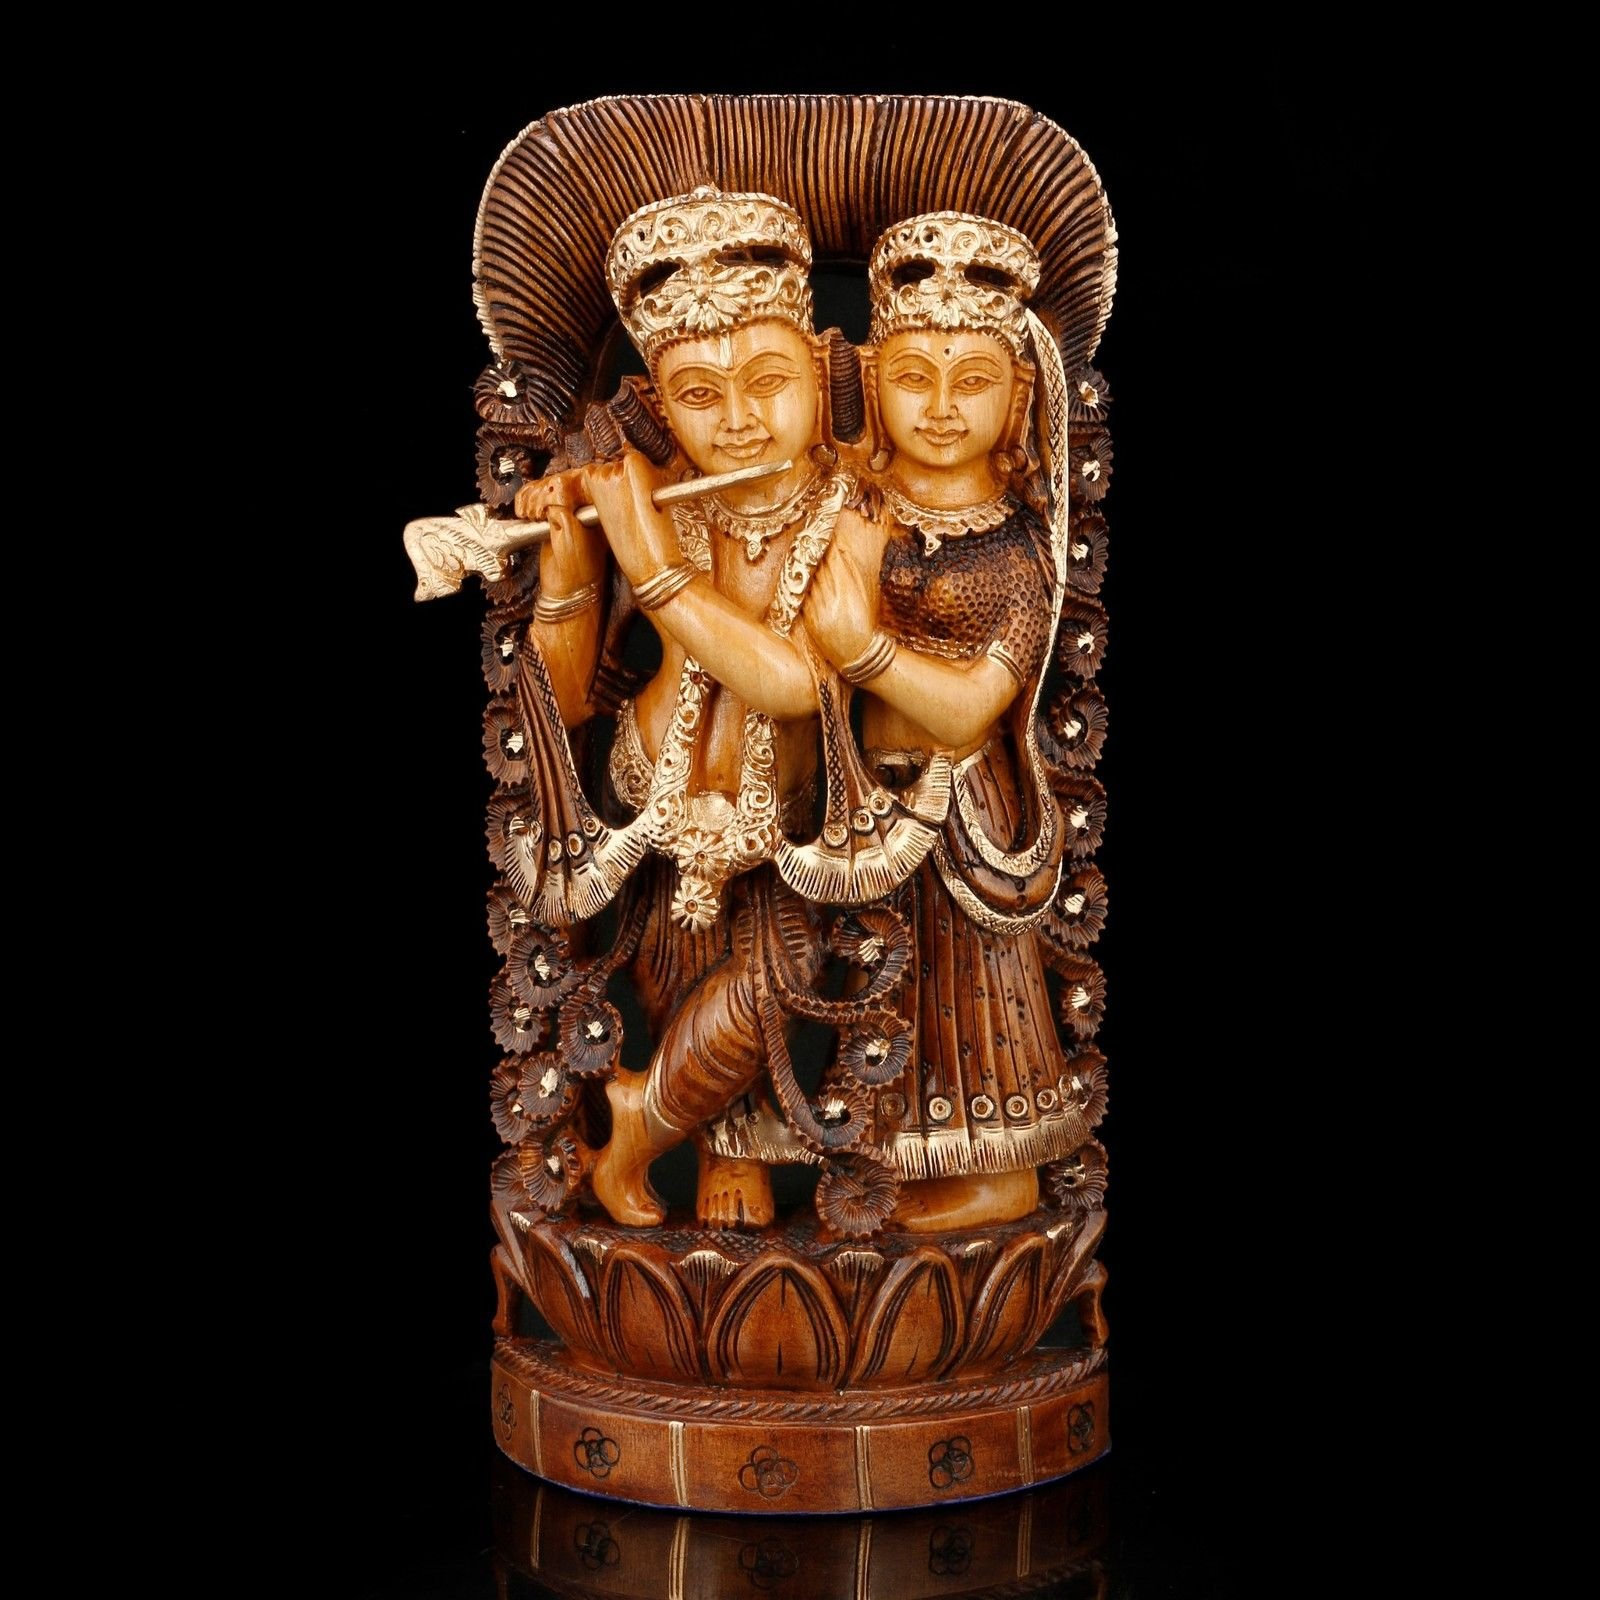 CraftVatika Large Radha Krishna Idol Hindu God Figurine Lord Love Wooden Radha Krishna Statue Handmade Decor Gift